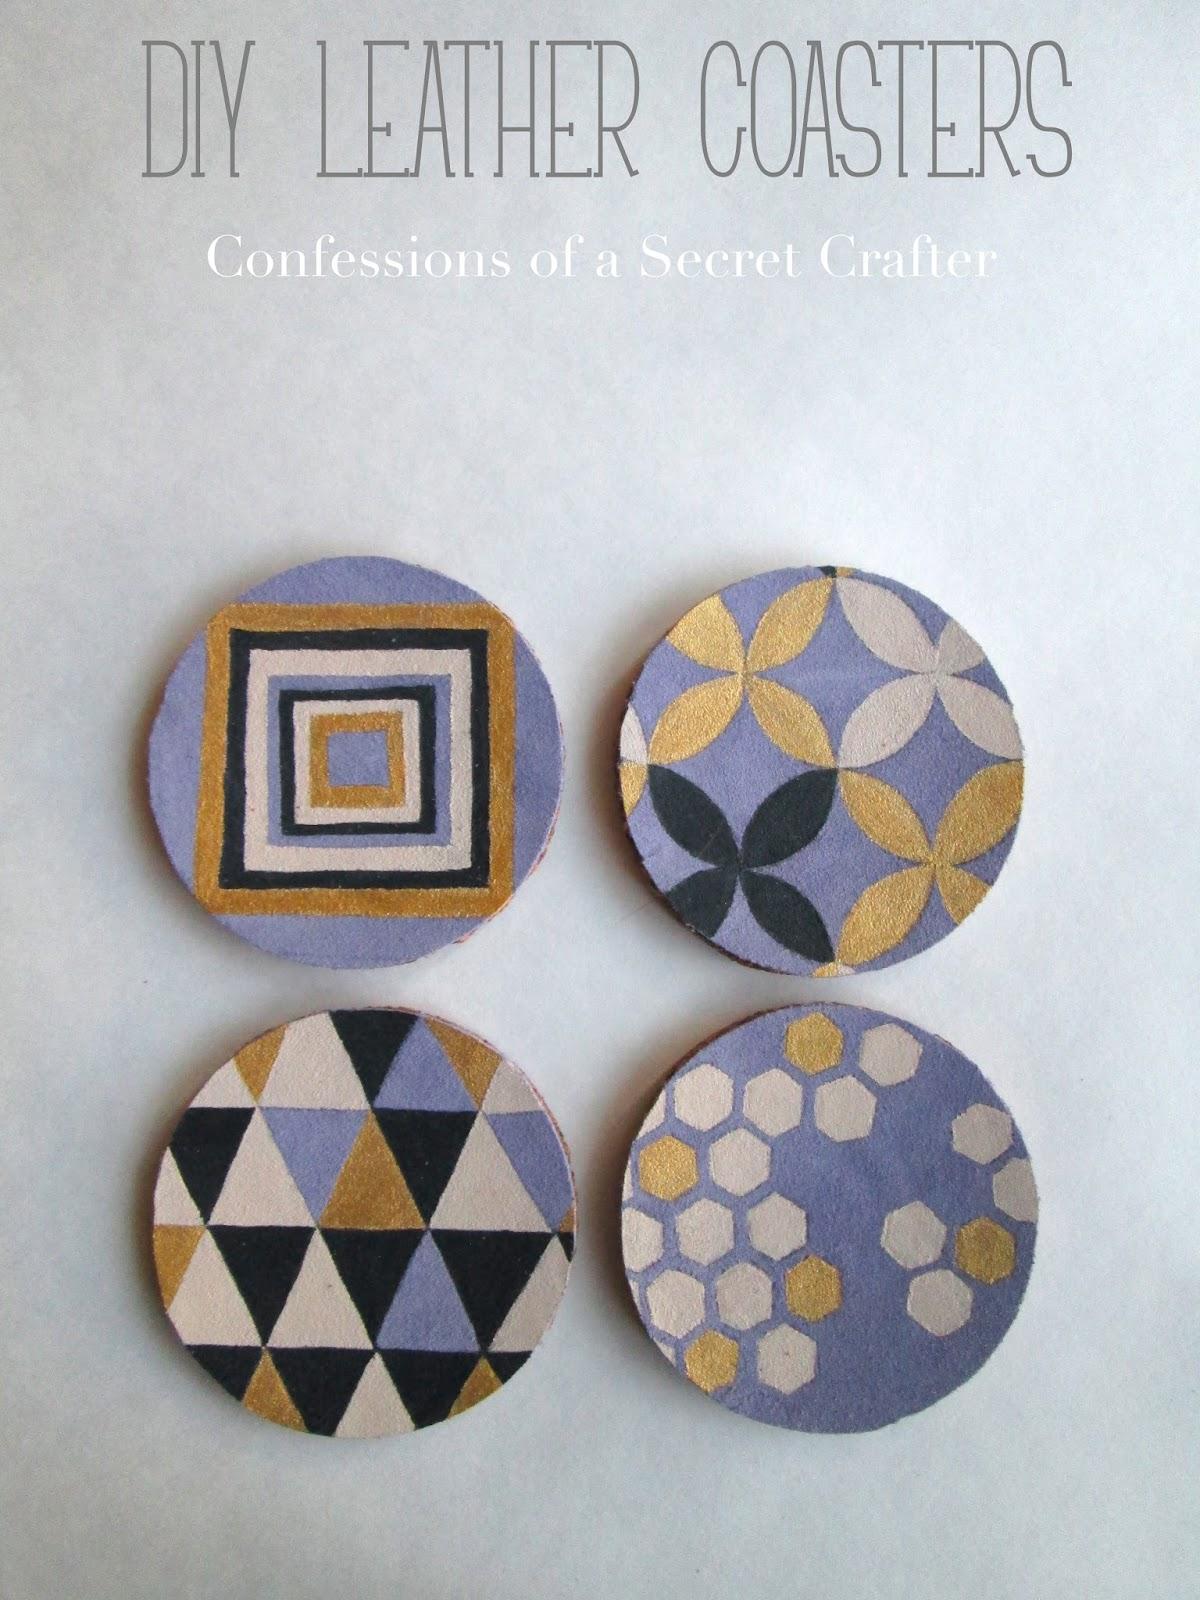 DIY Leather Coaster